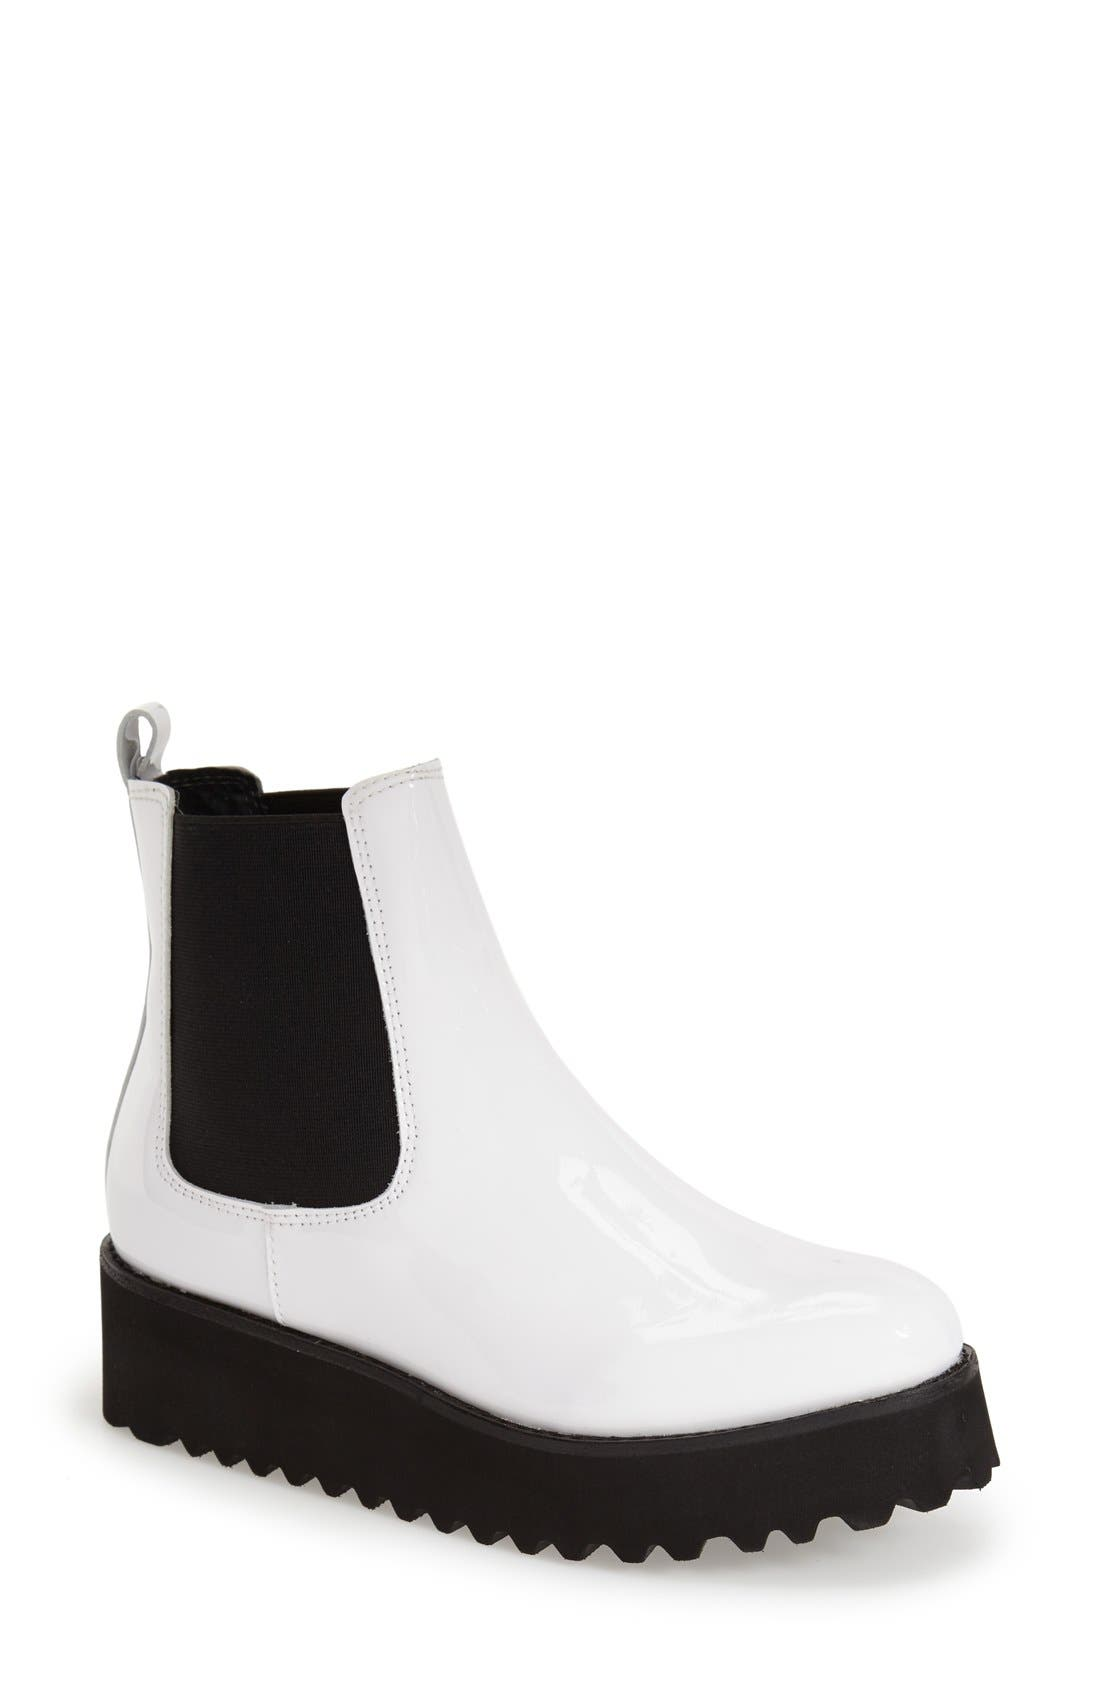 Alternate Image 1 Selected - Jeffrey Campbell 'Zayden' Platform Chelsea Boot (Women)